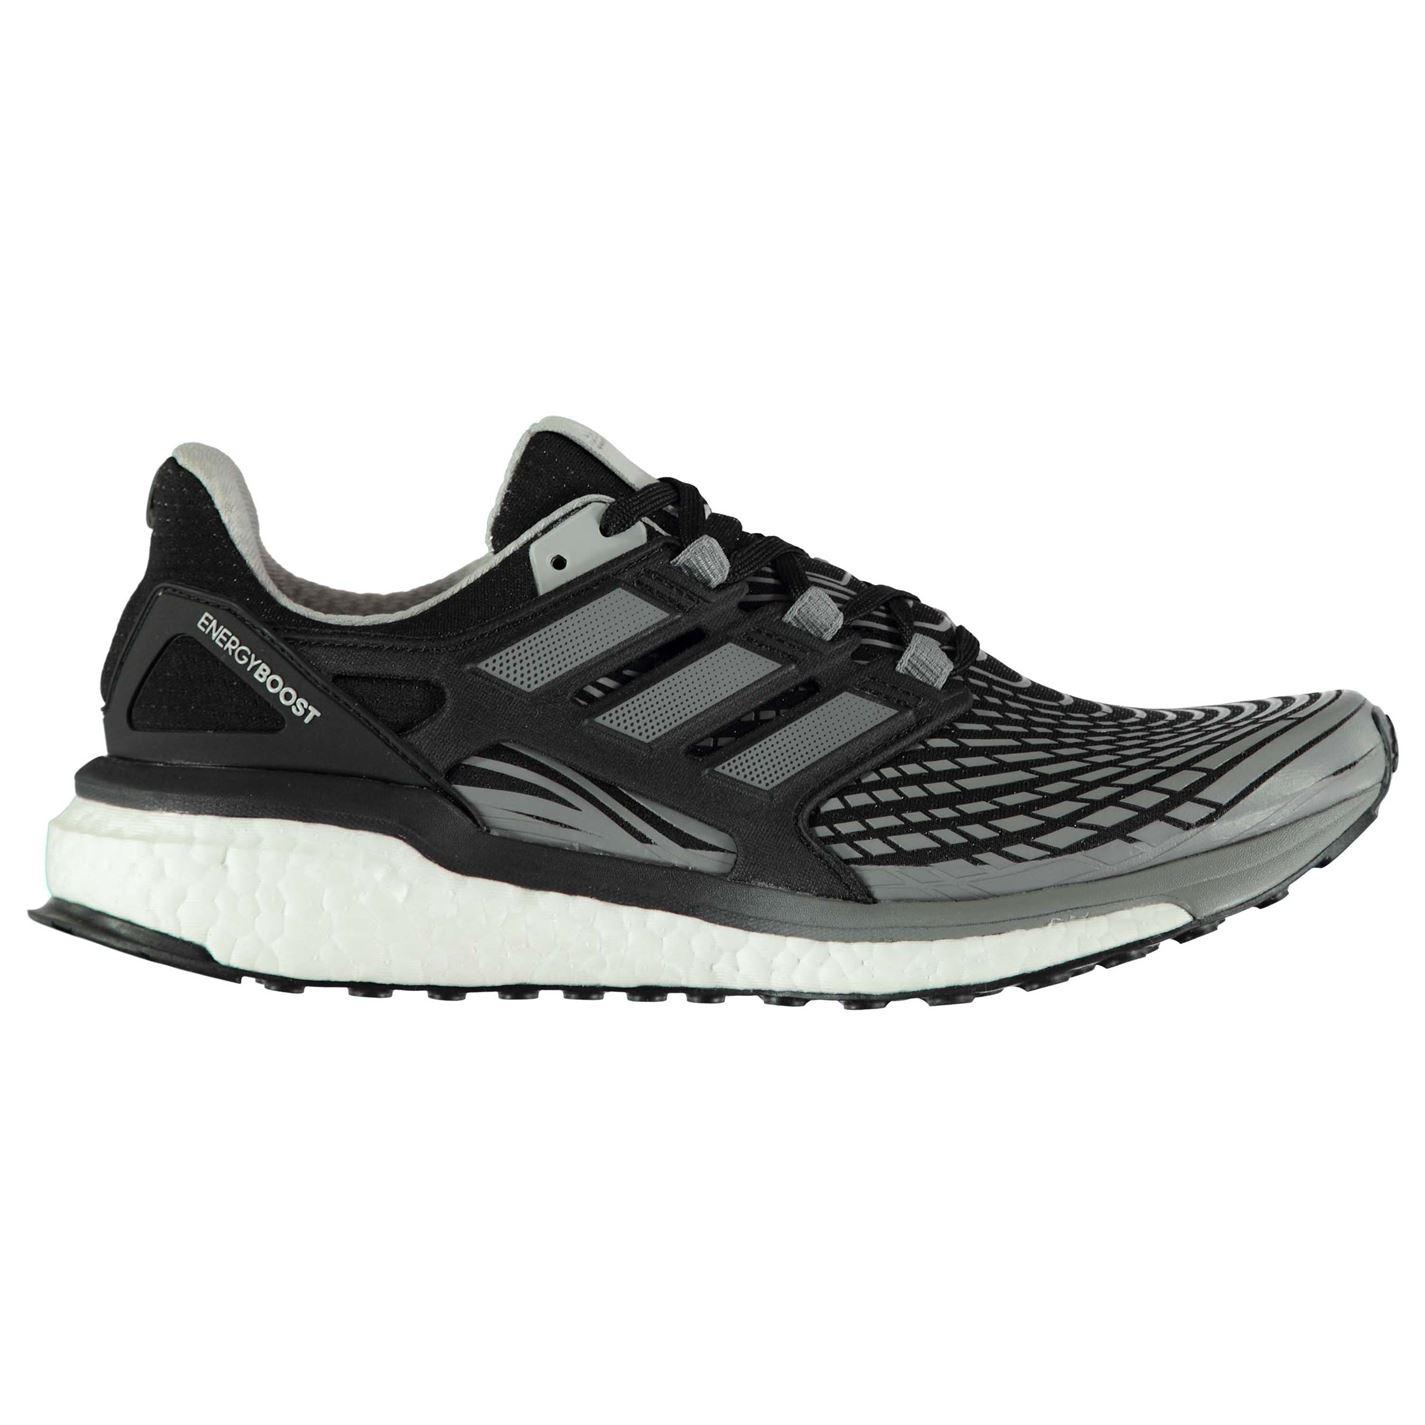 adidas Energy Boost Mens Running Shoes - Glami.hu 327b8d35b51